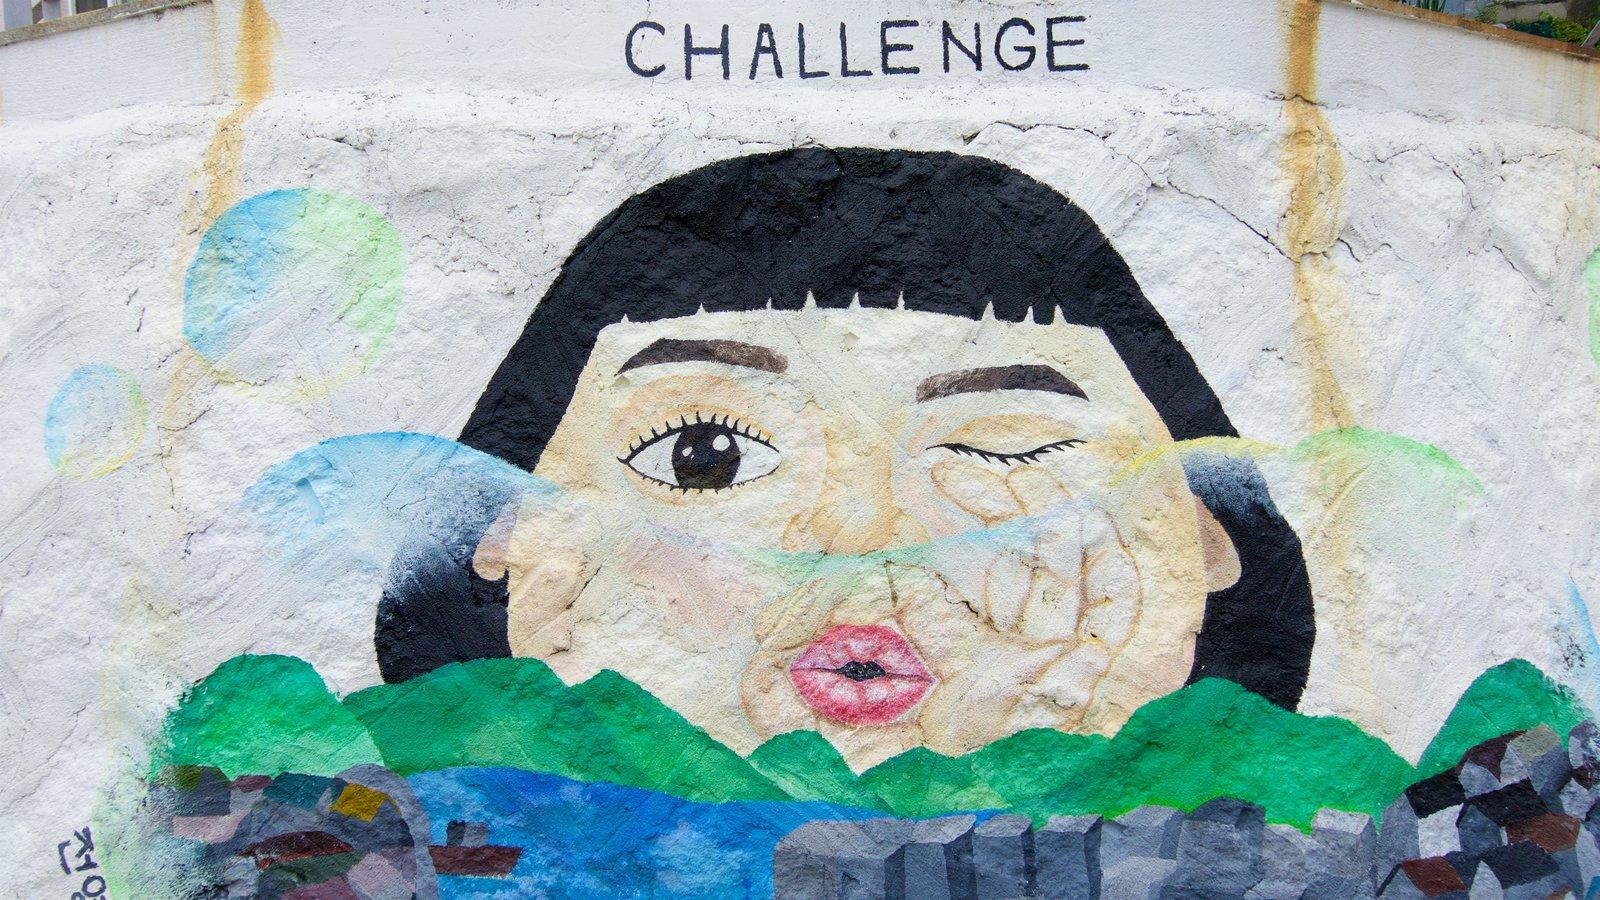 Aldea de muros pintados de Dongpirang ofreciendo arte al aire libre